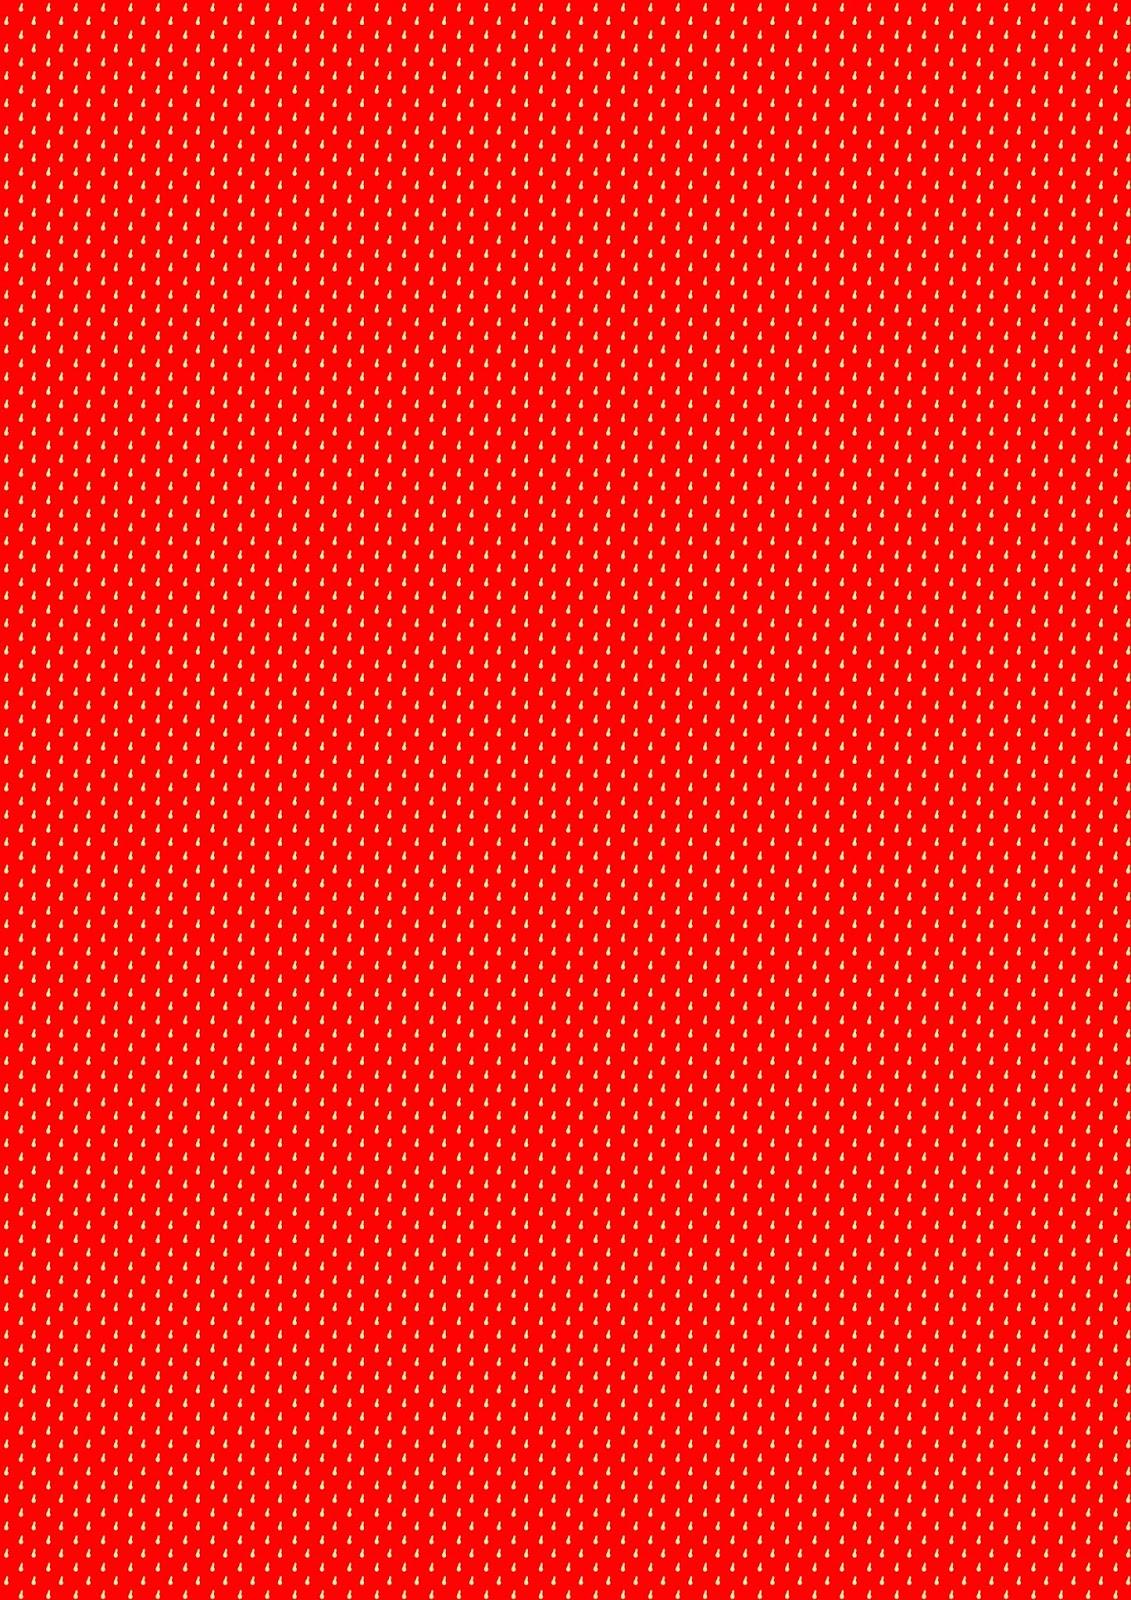 Free digital strawberry red scrapbooking paper - ausdruckbares ...